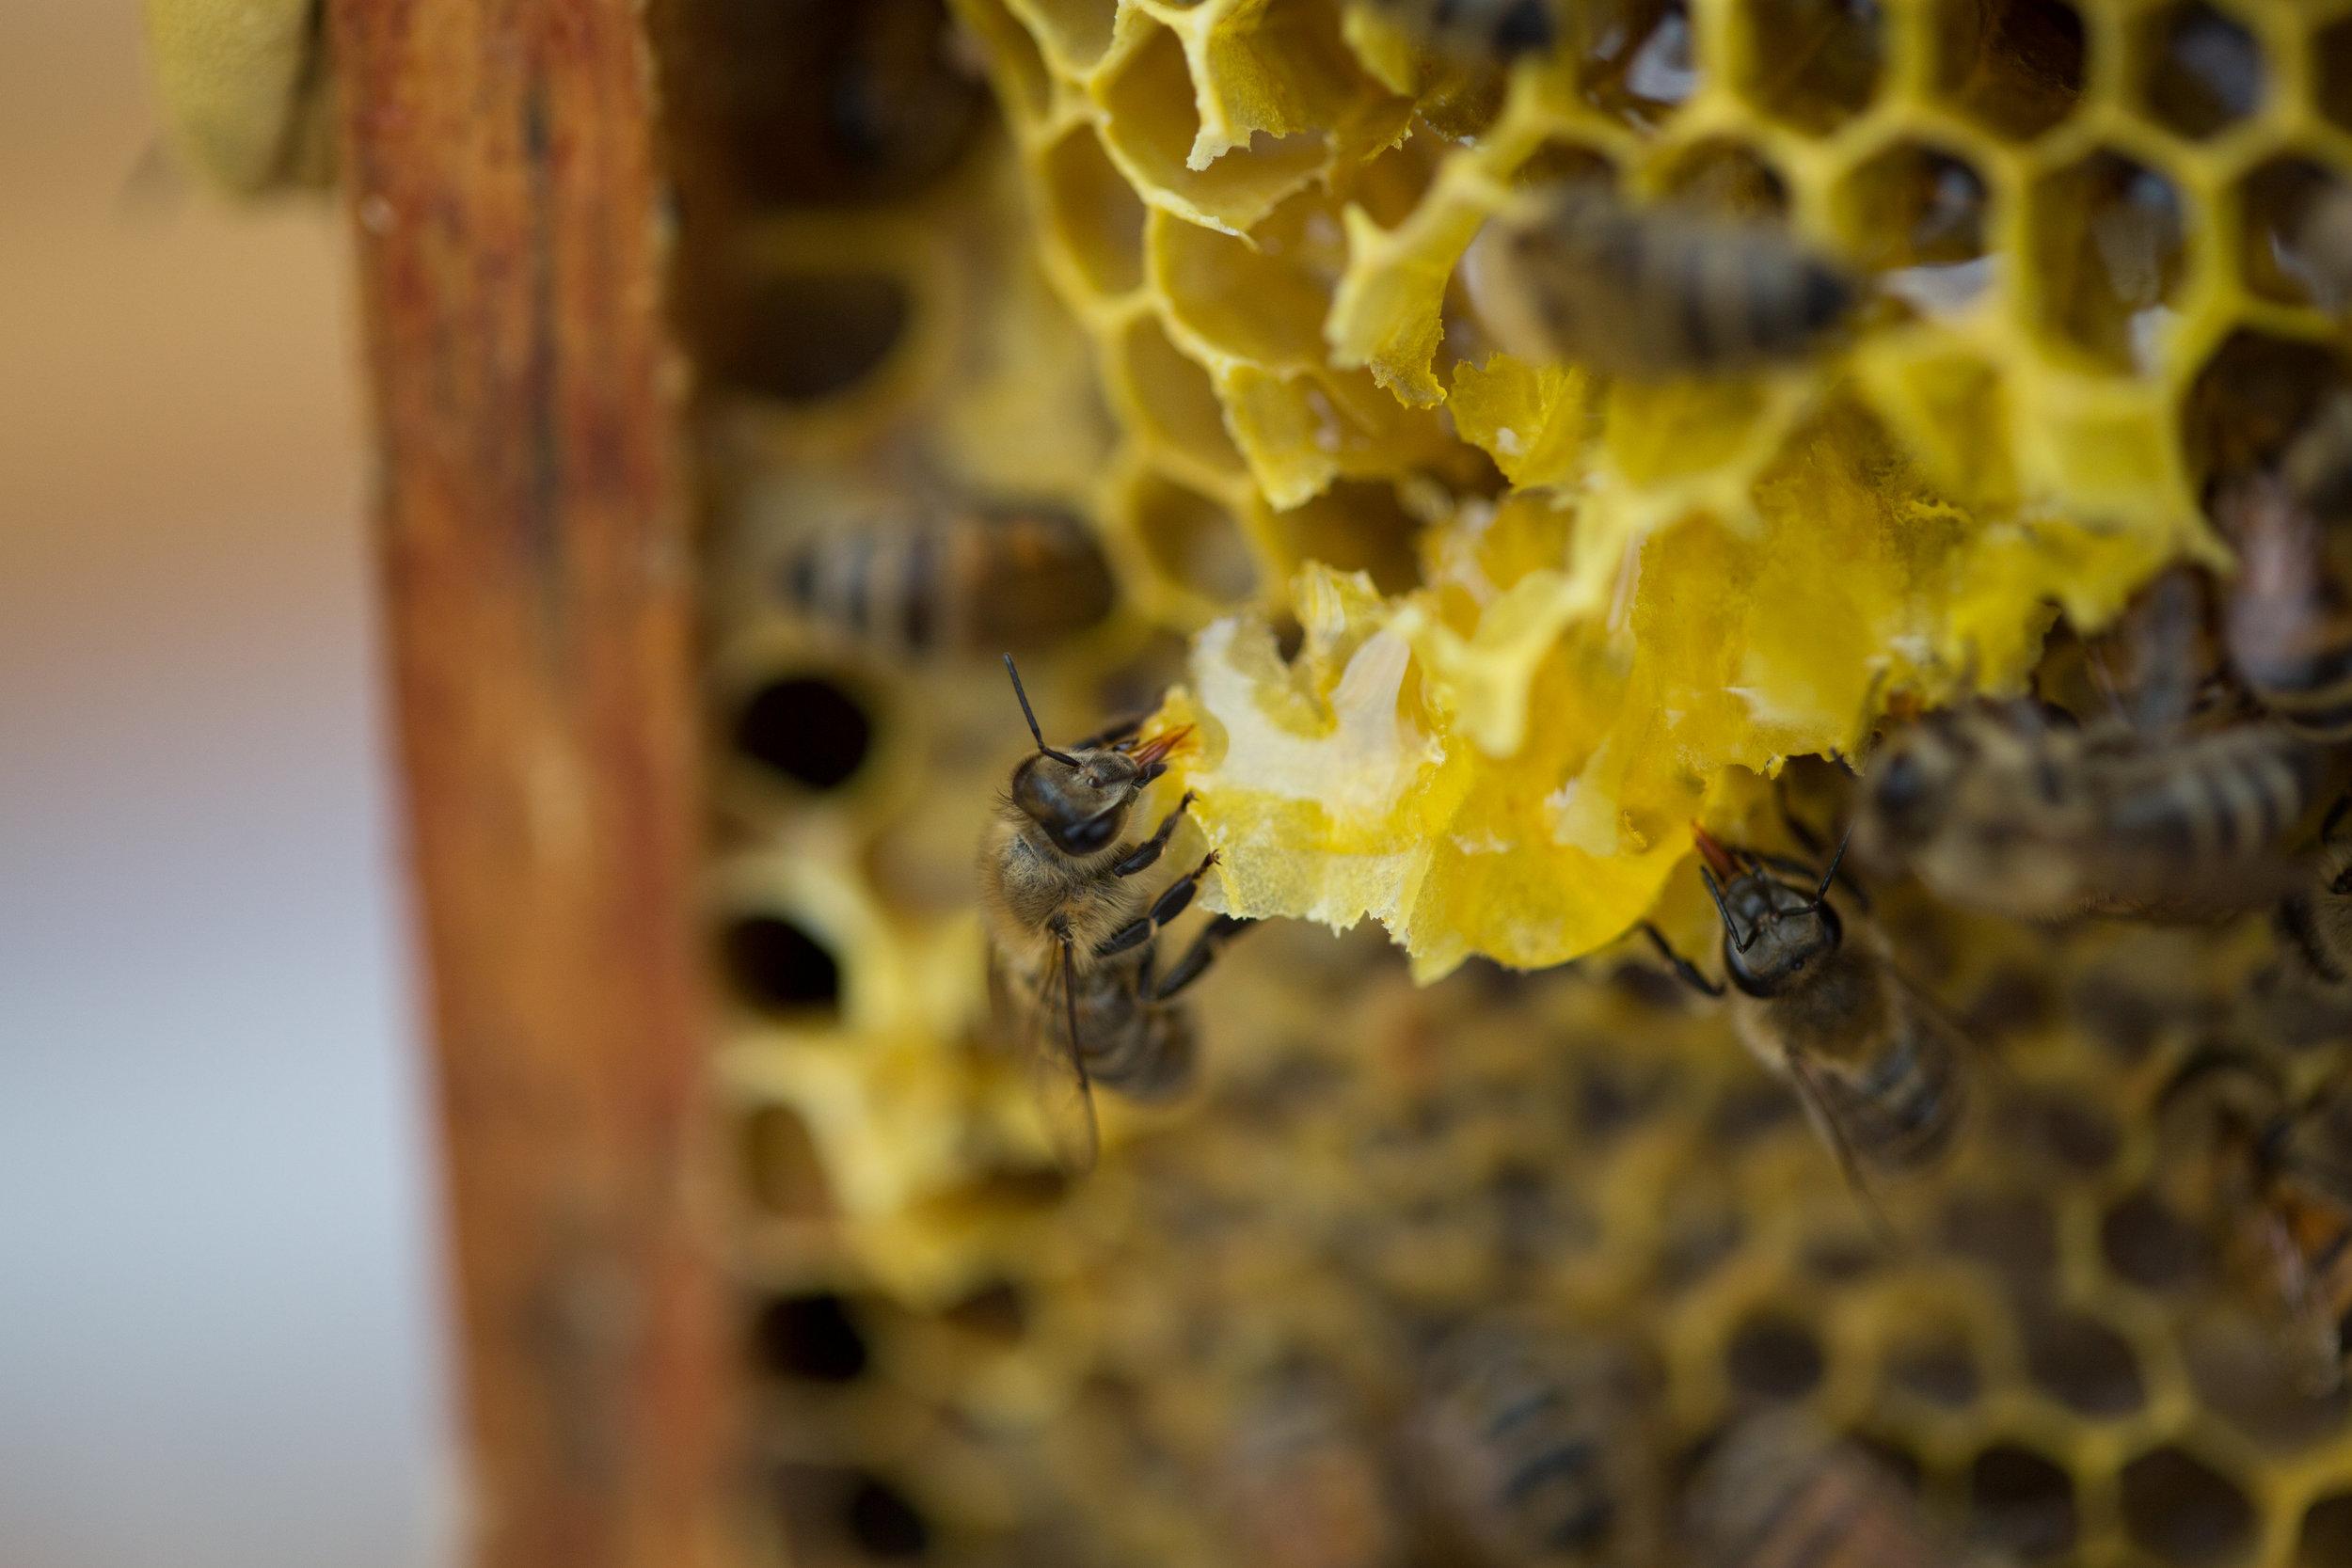 bee whyld honey looking delicious